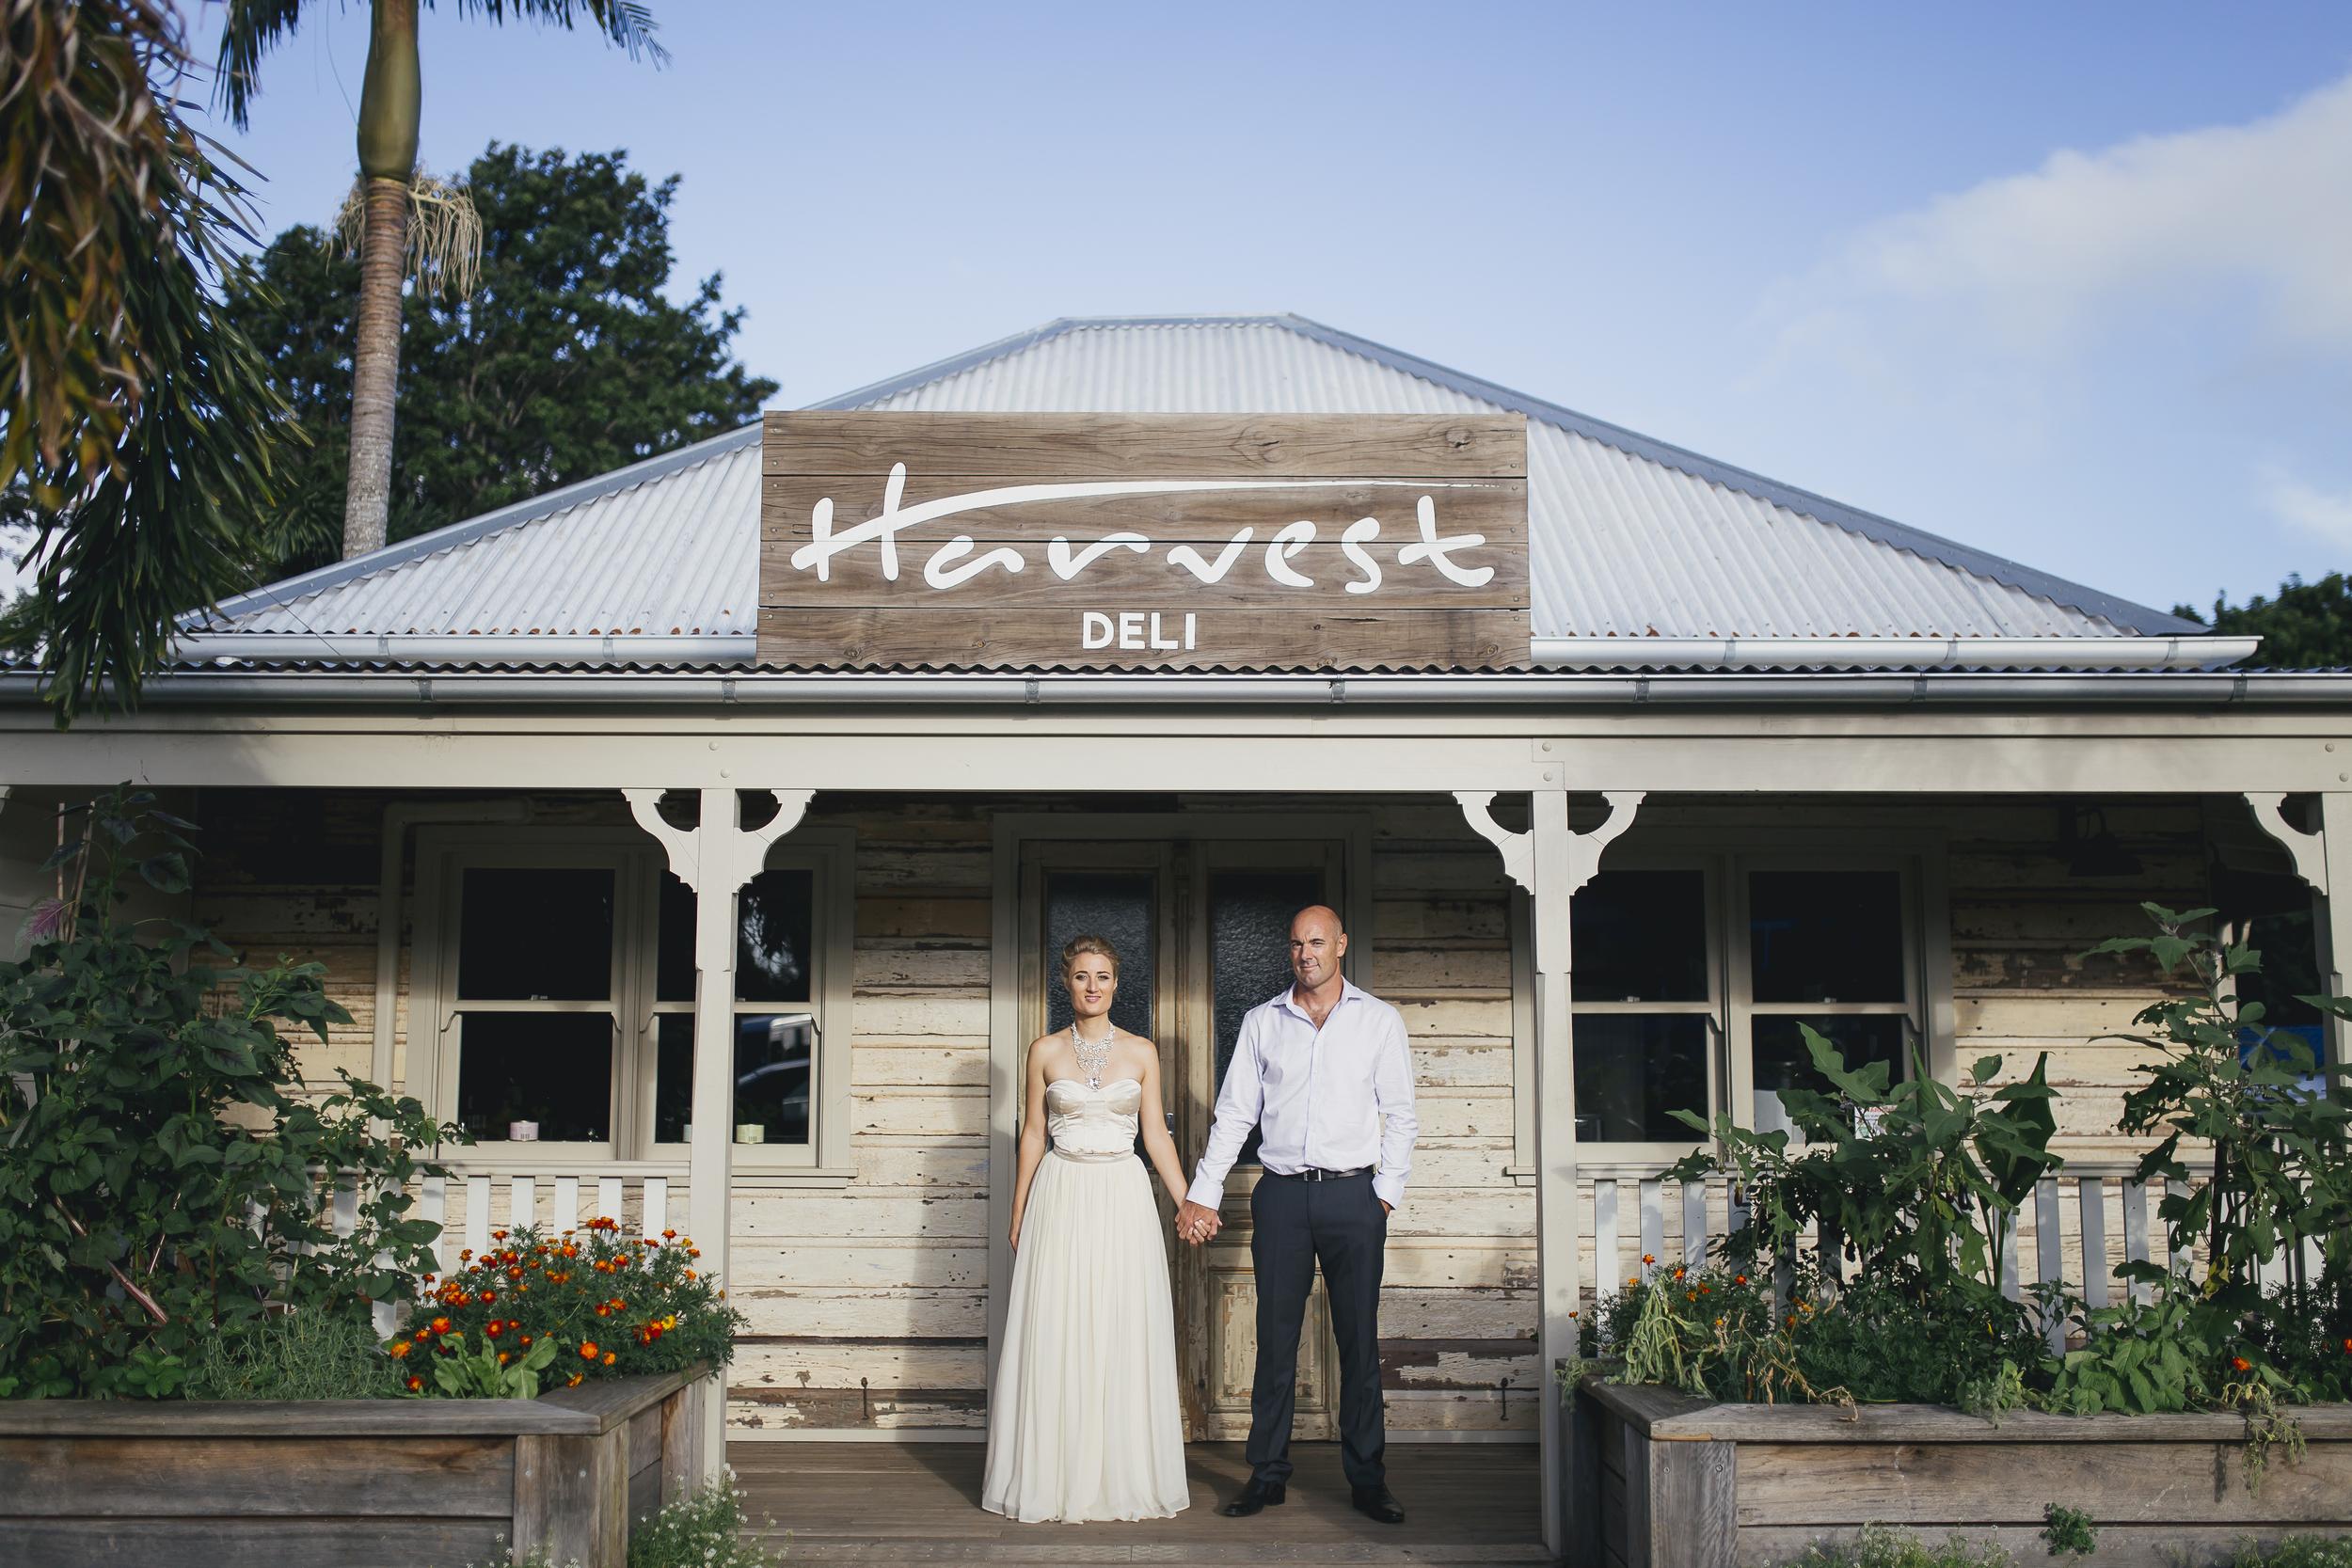 Byron Bay Wedding Harvest Cafe - Carly Tia Photography 032.jpg